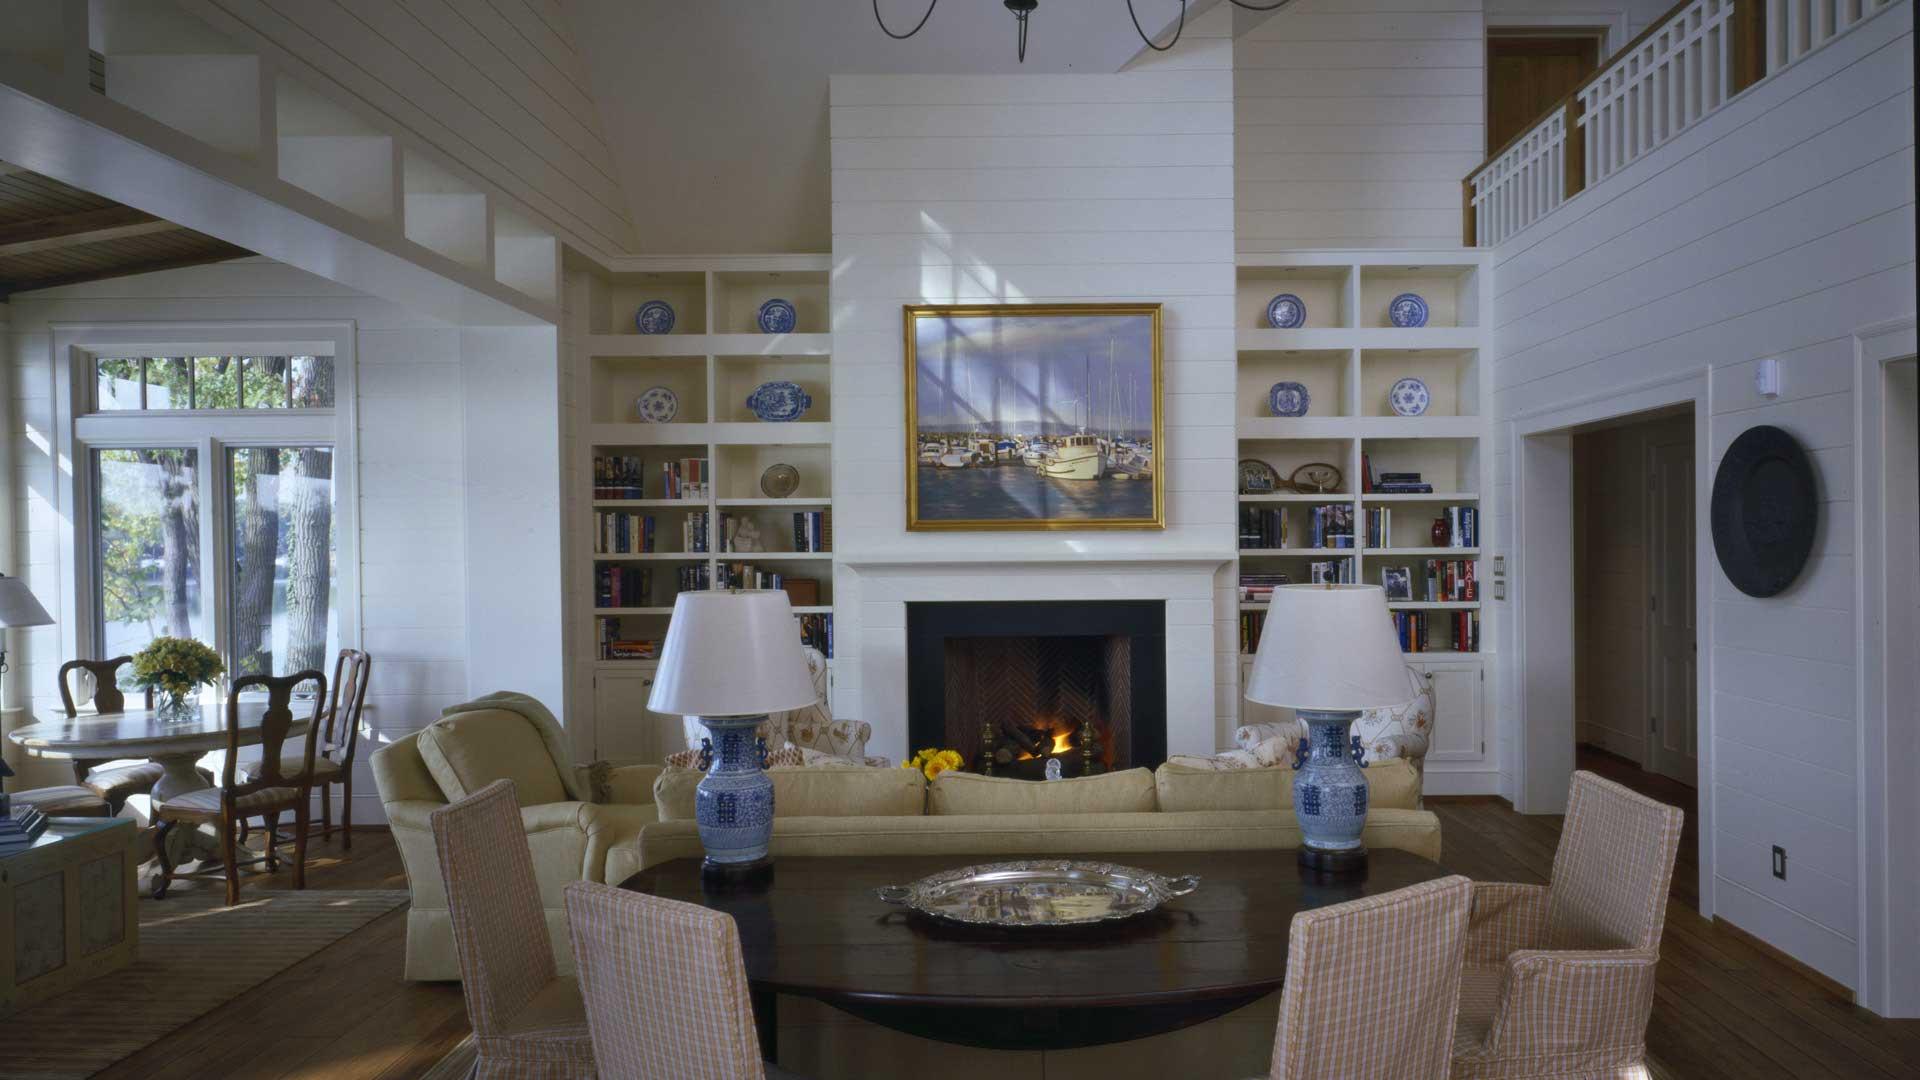 Nantucket Bay Shingle Style - Main Living Hidden TV - HAUS Architecture, Christopher Short, Indianapolis Architect